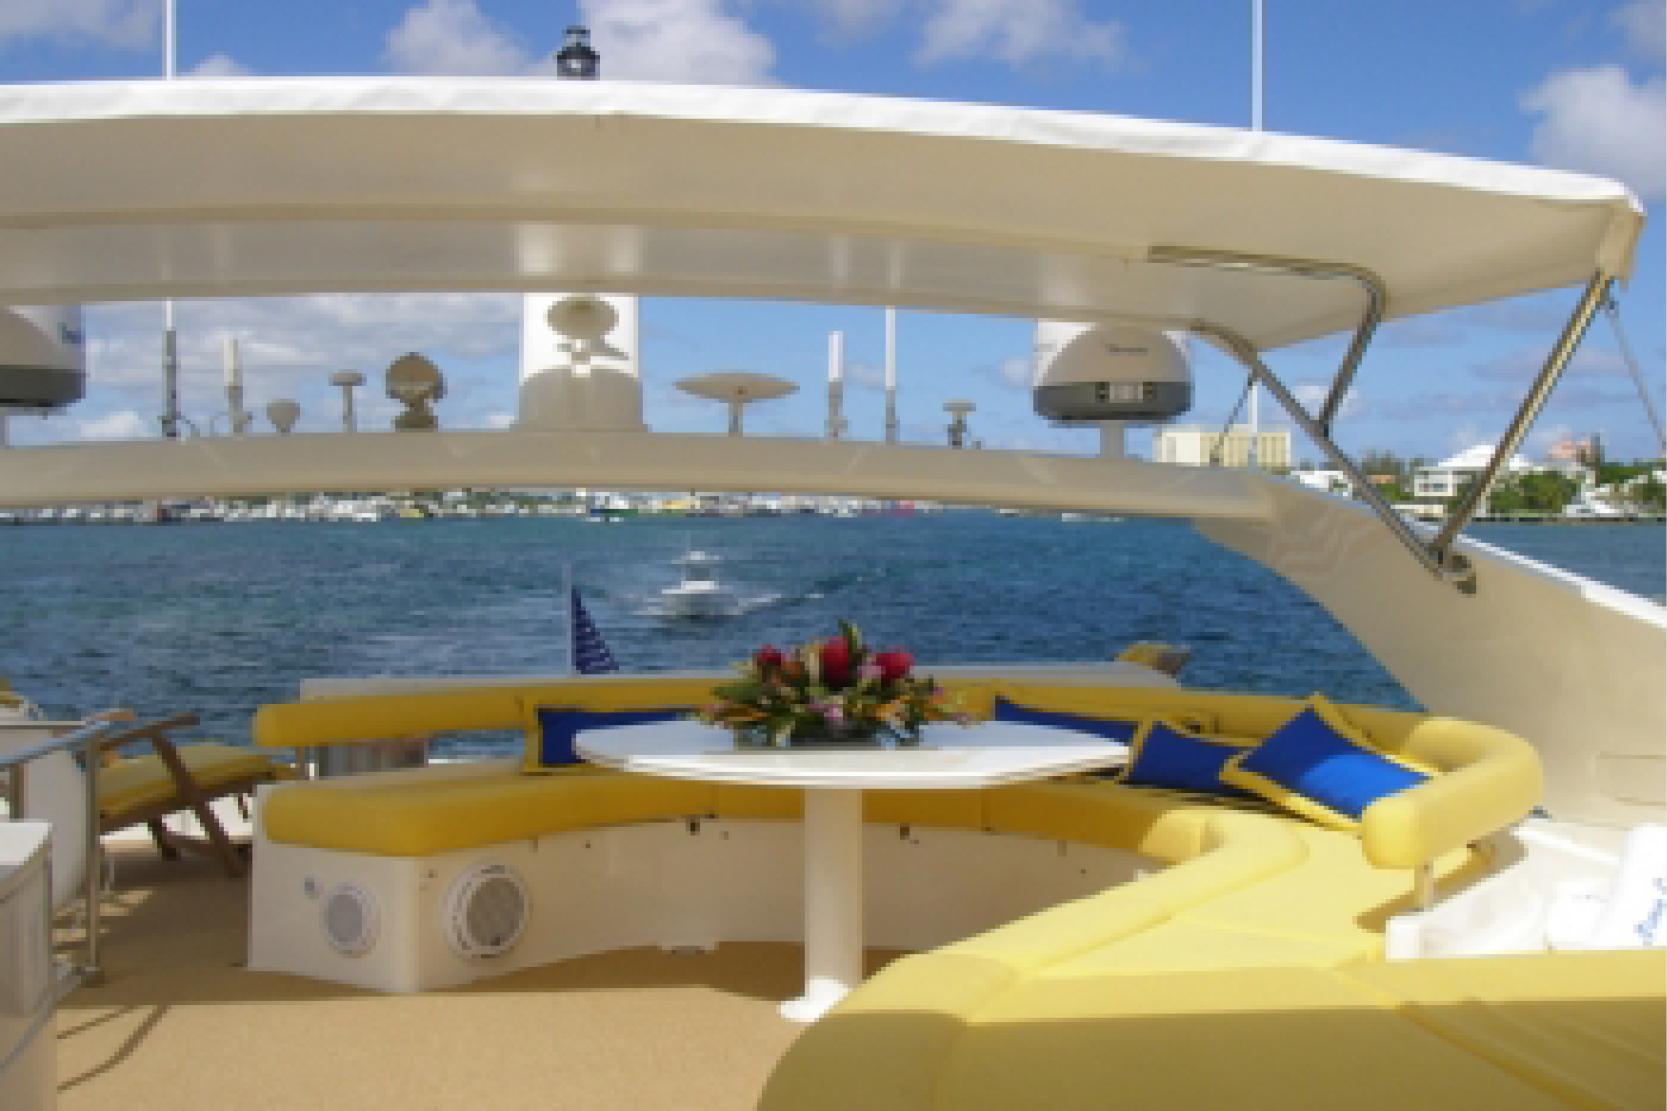 Karen-Lynn-Interior-Design-Yacht-Sioux_7.jpg